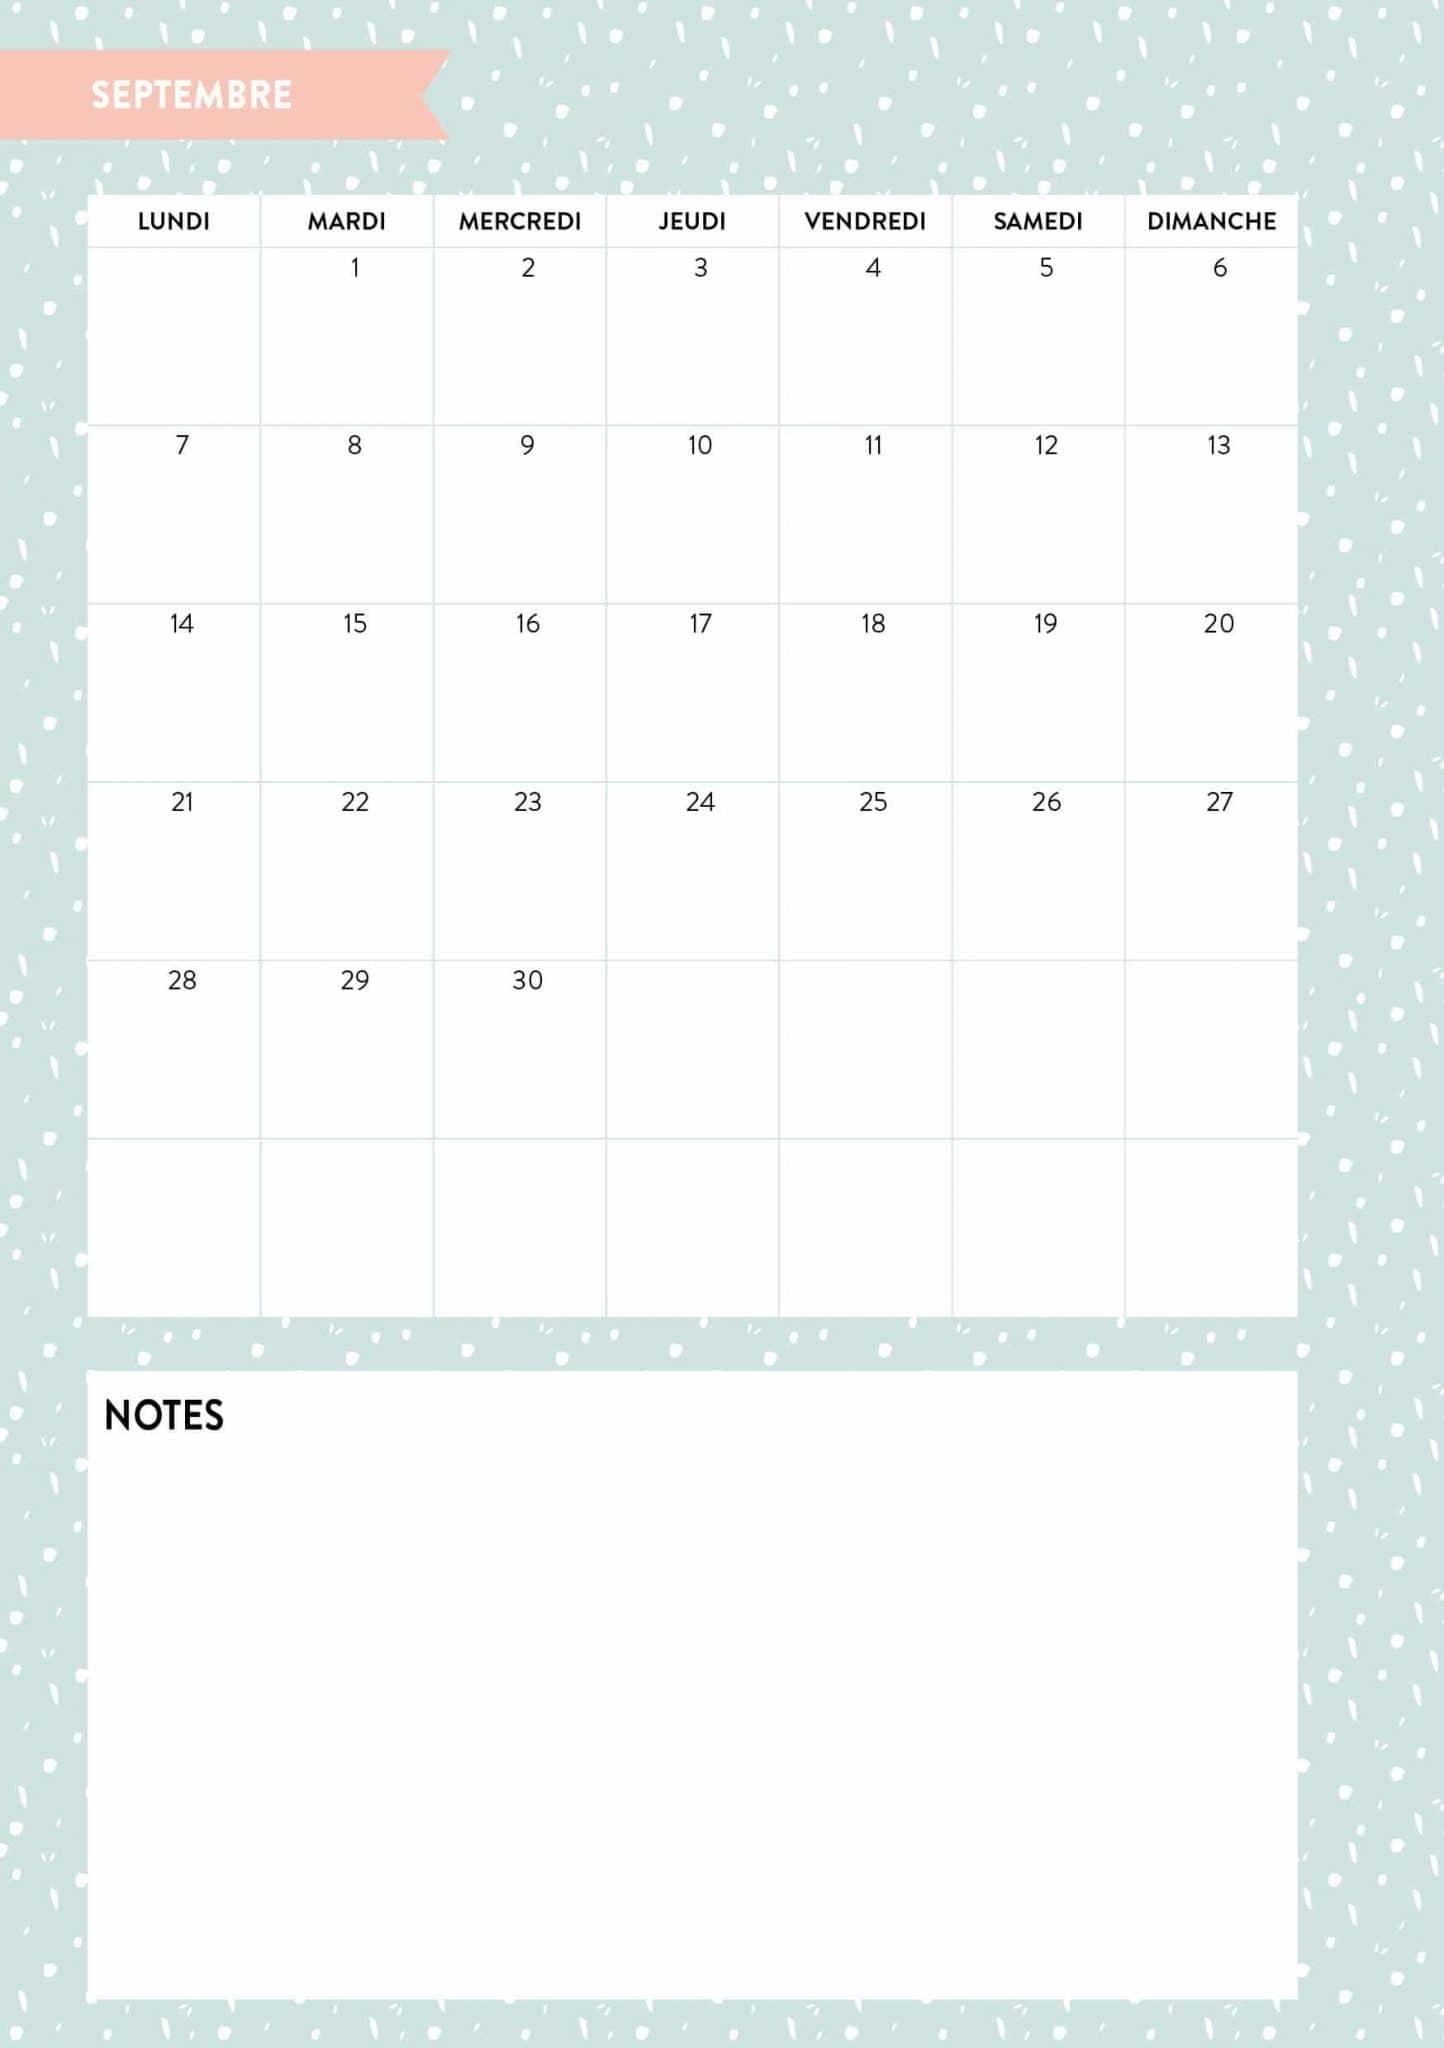 L'agenda 2020 qui me veut du bien : calendrier mensuel - 22 v'la Scarlett